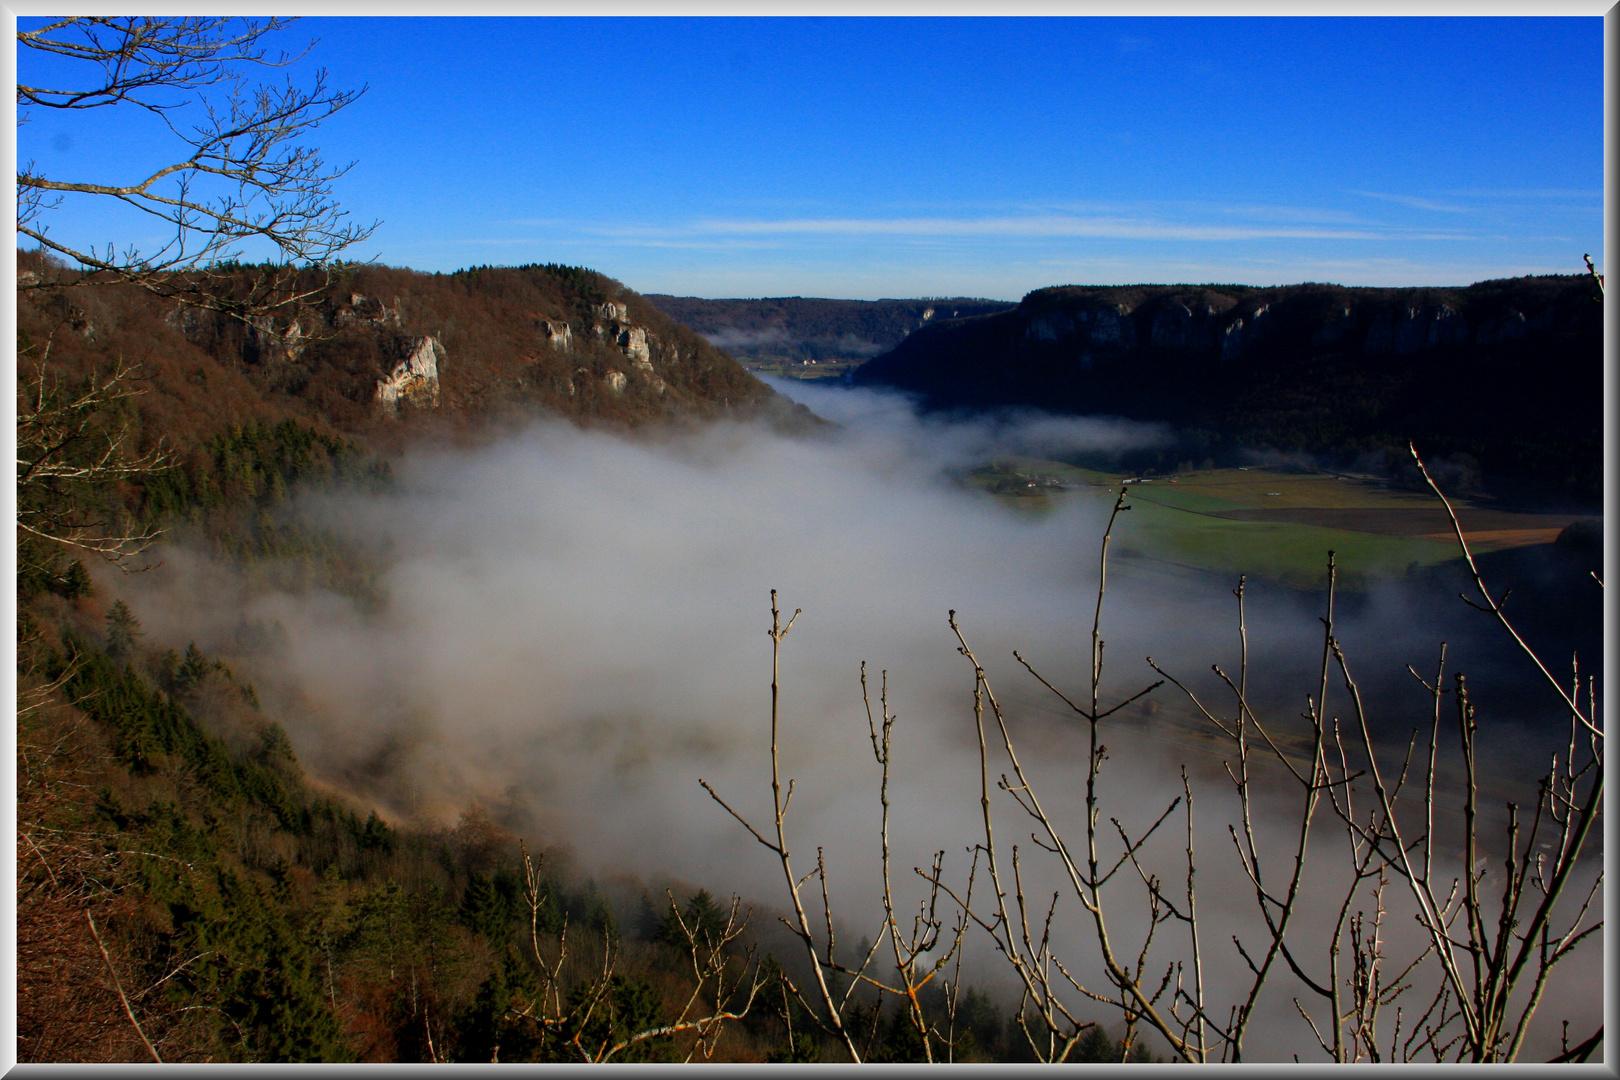 La Danube